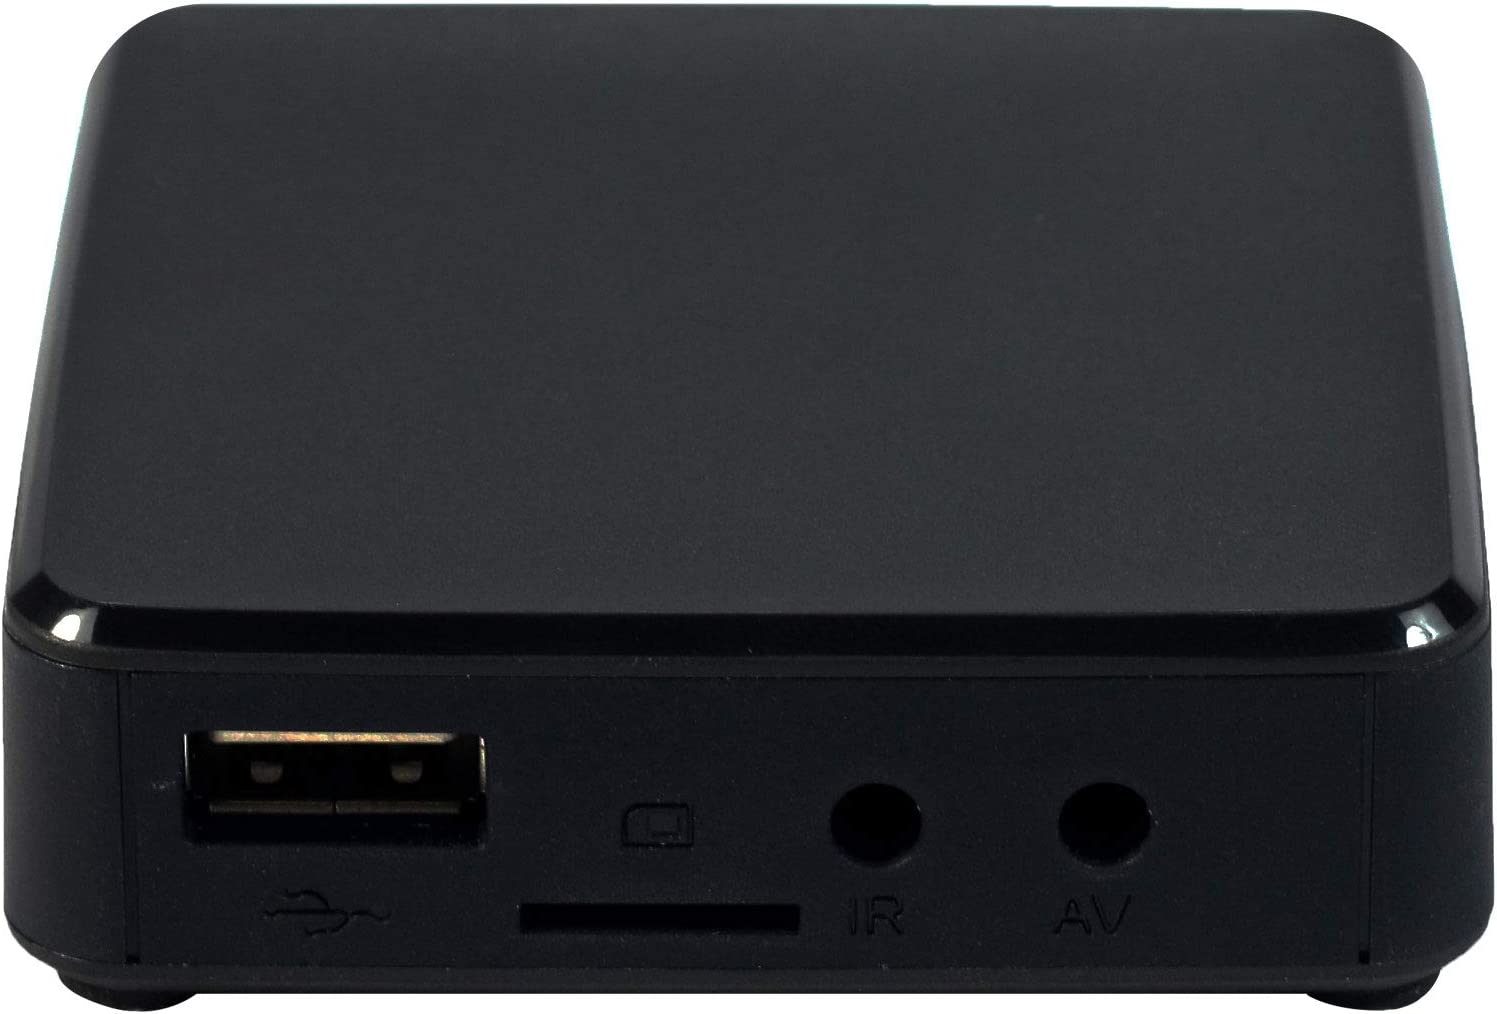 EXT.IR 4 GB Flash MicroSD Card TVIP S-Box v.412se IPTV HEVC HD ...